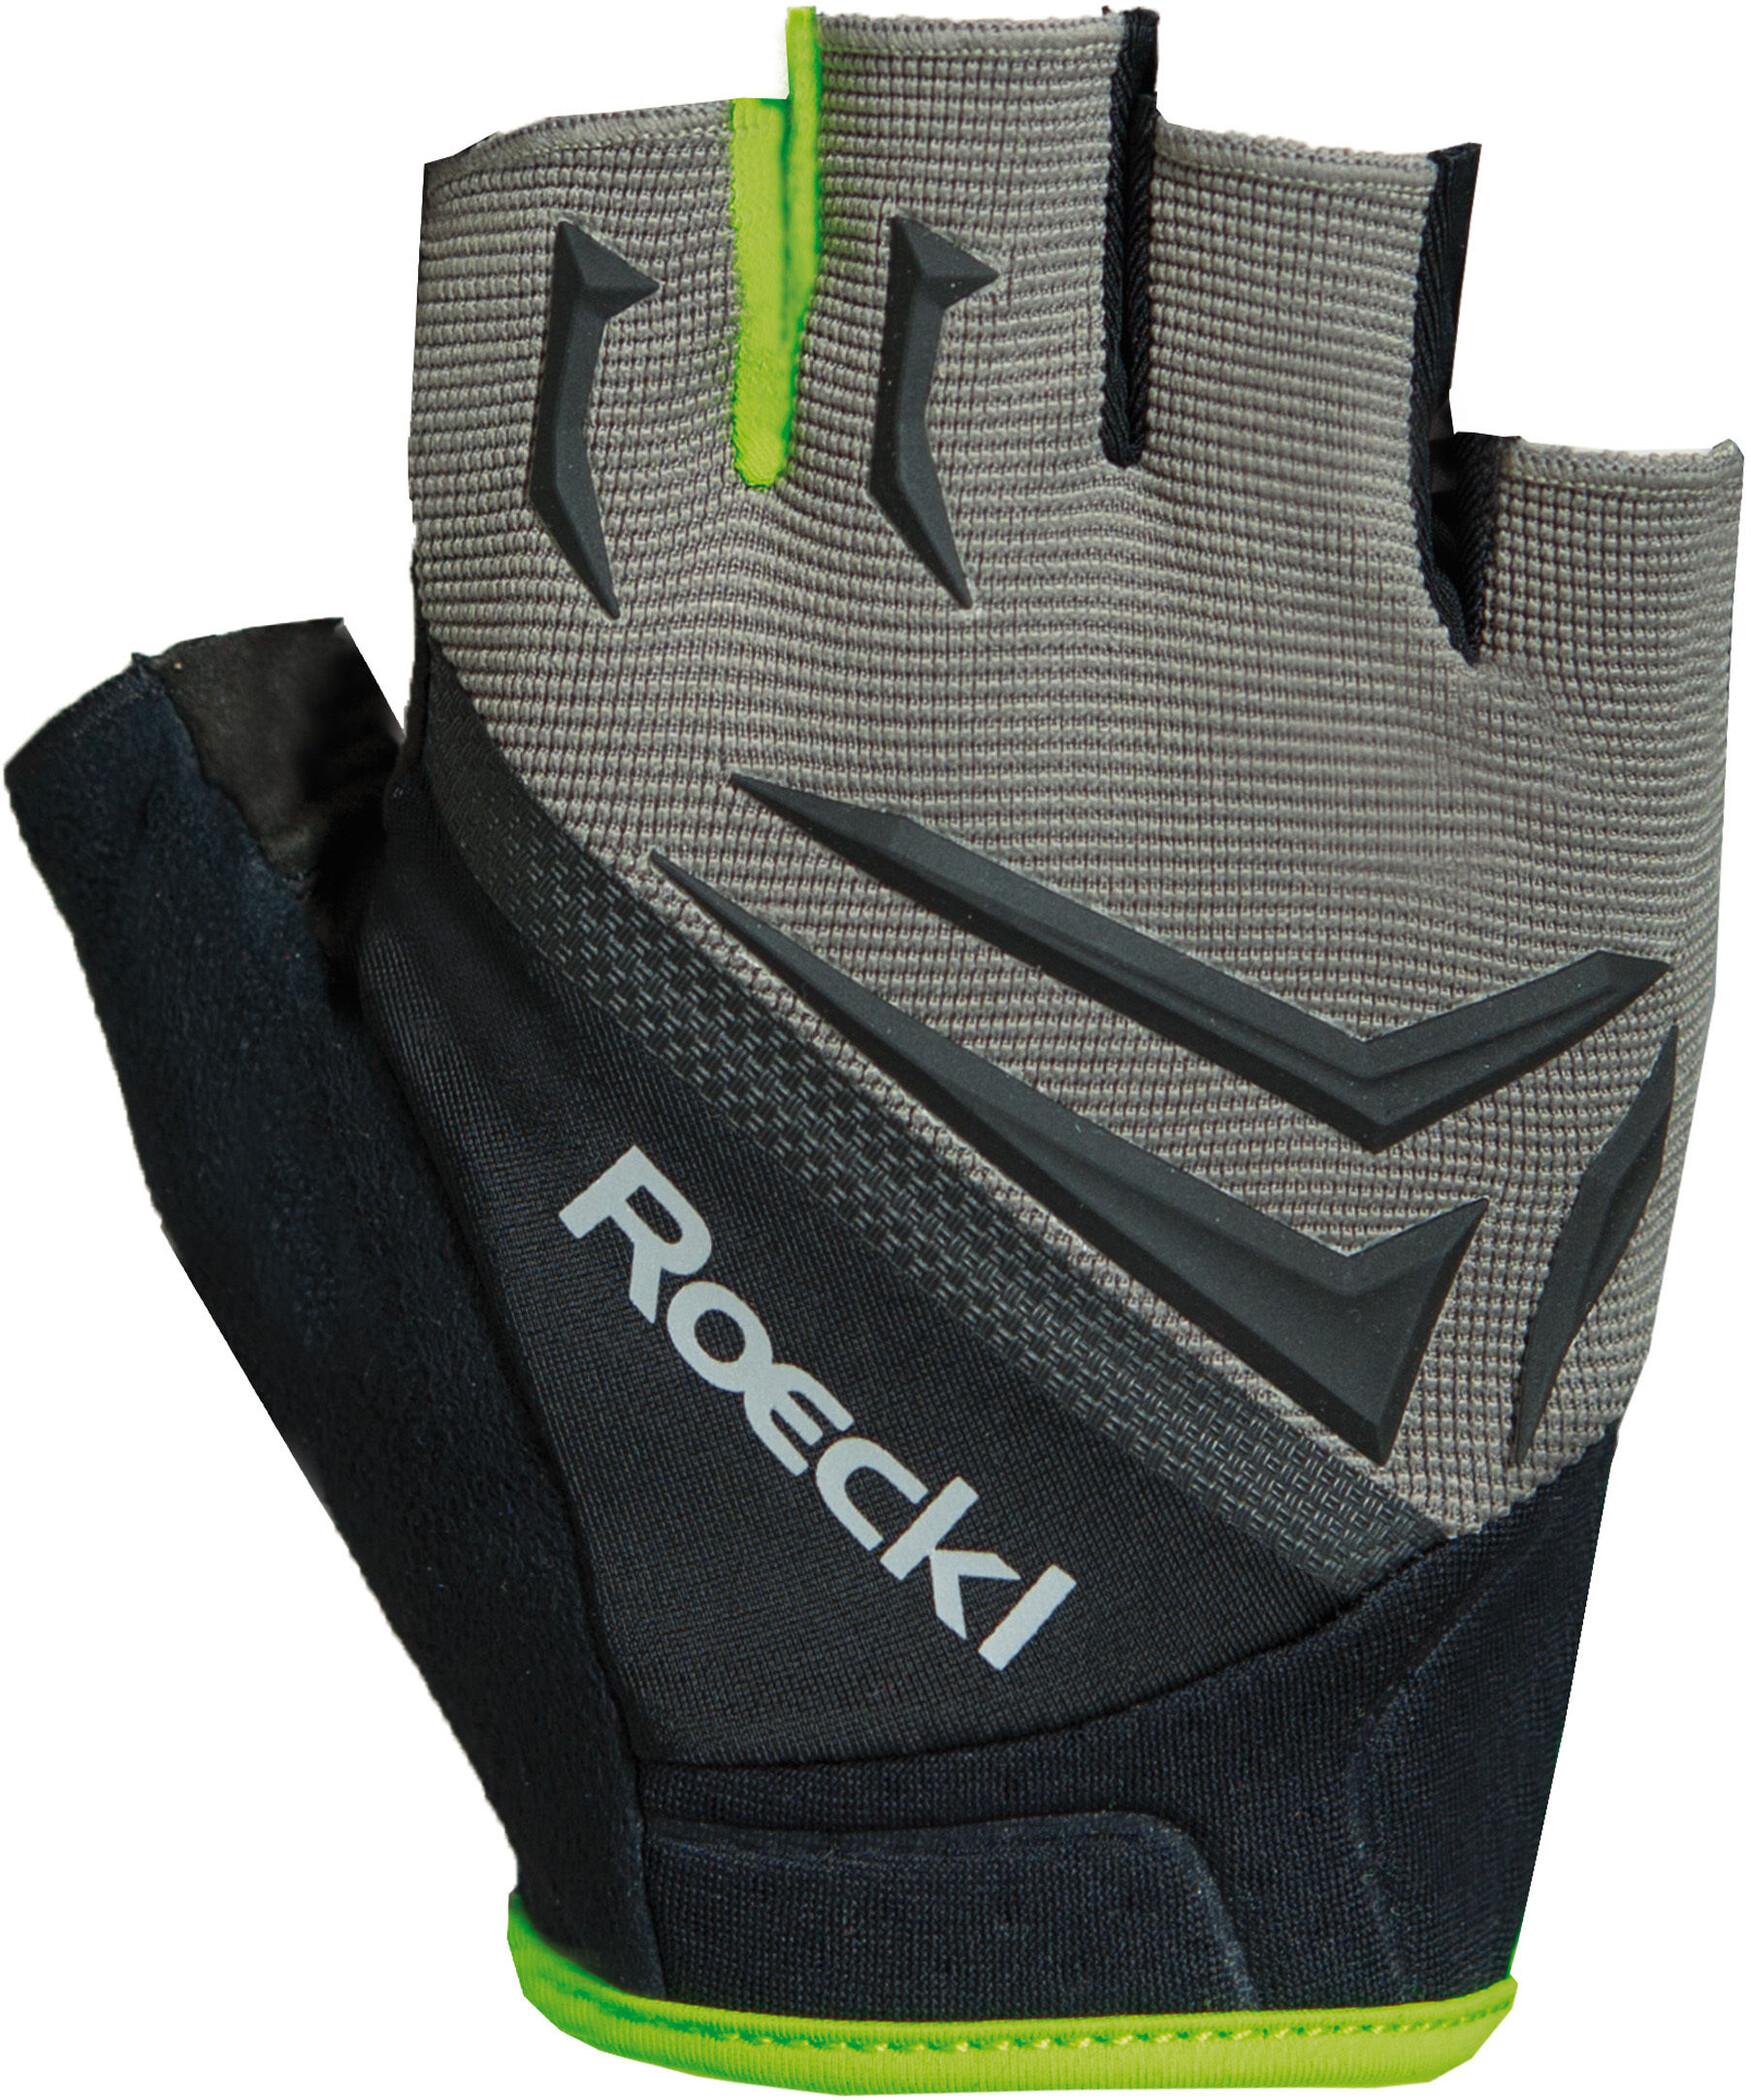 Roeckl Isar Cykelhandsker, grey (2019) | Gloves